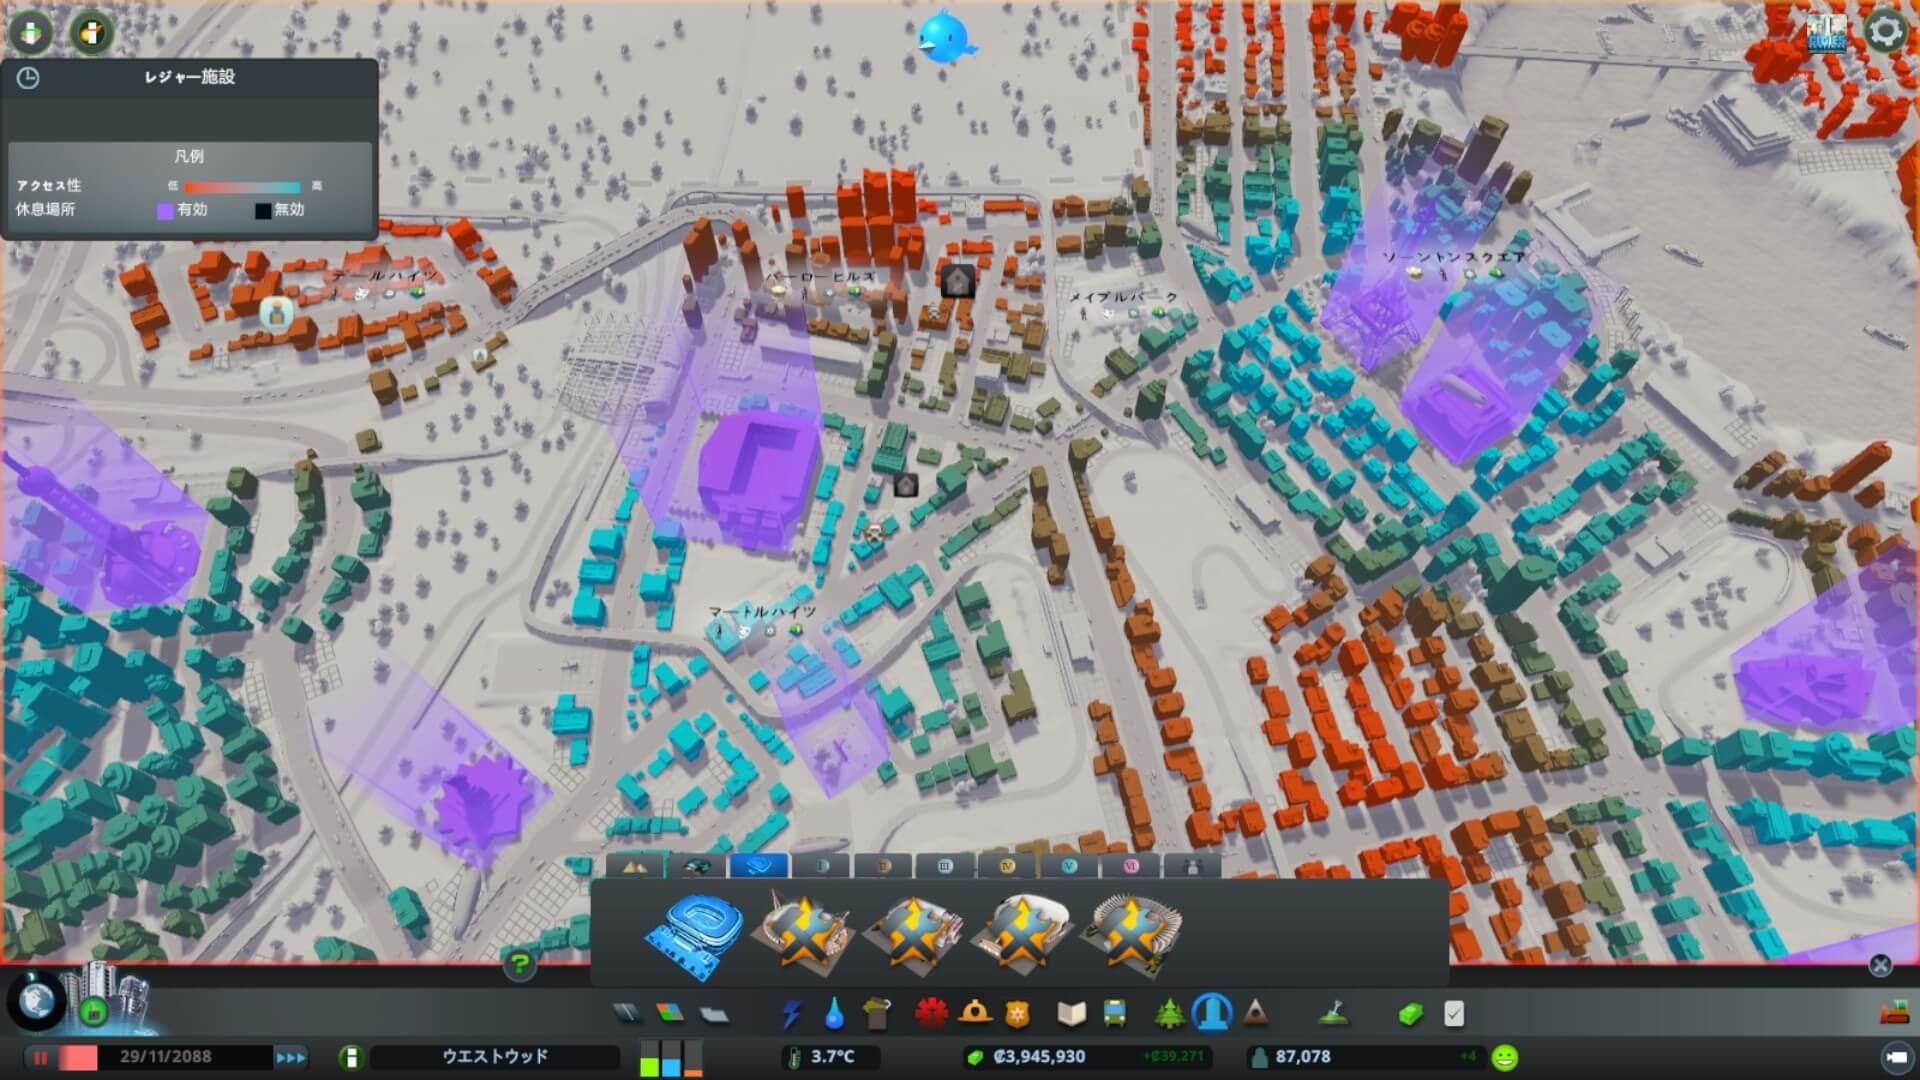 office005-1024x576 【シティーズ スカイライン 攻略ブログ】 特化地区とオフィス区画で高収益を目指す Cities:Skylines(シティーズ:スカイライン ) 街作りシミュレーションゲーム